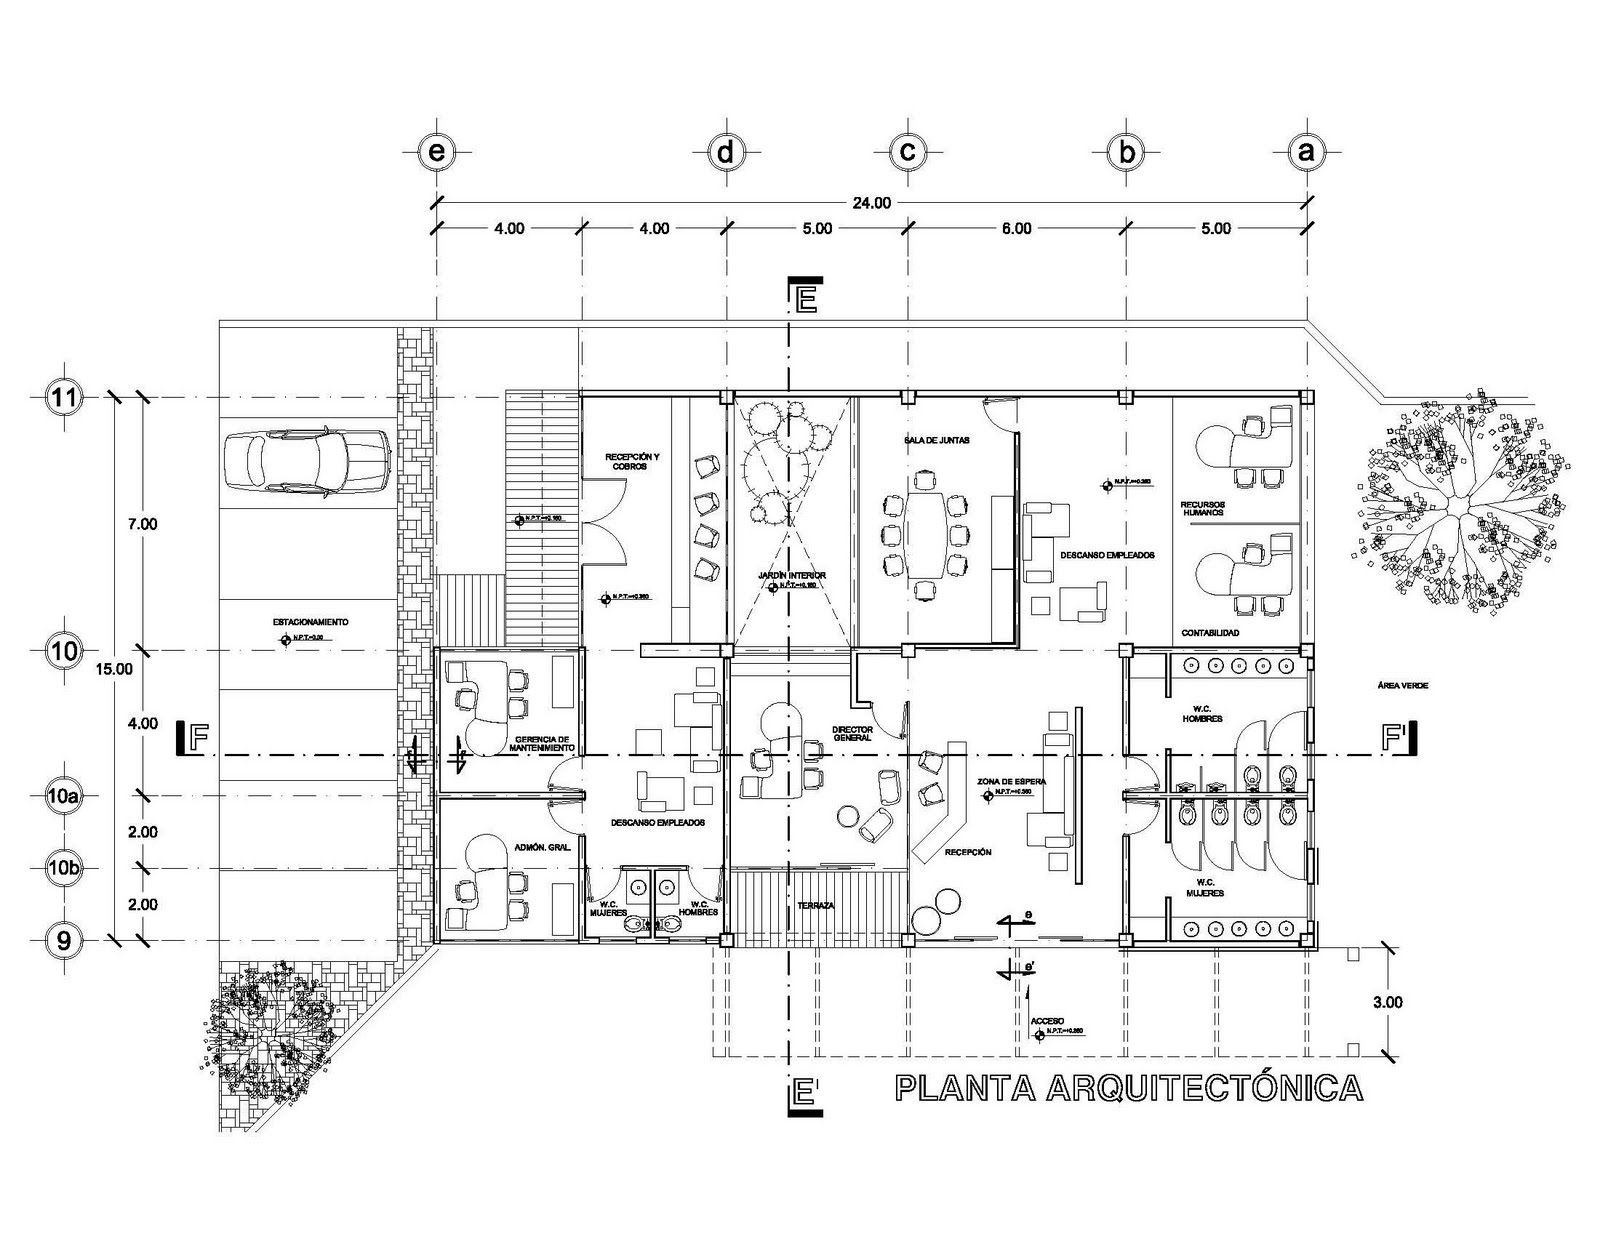 Dibujante arquitectonico definici n y perfil profesional for Programas para disenar planos arquitectonicos